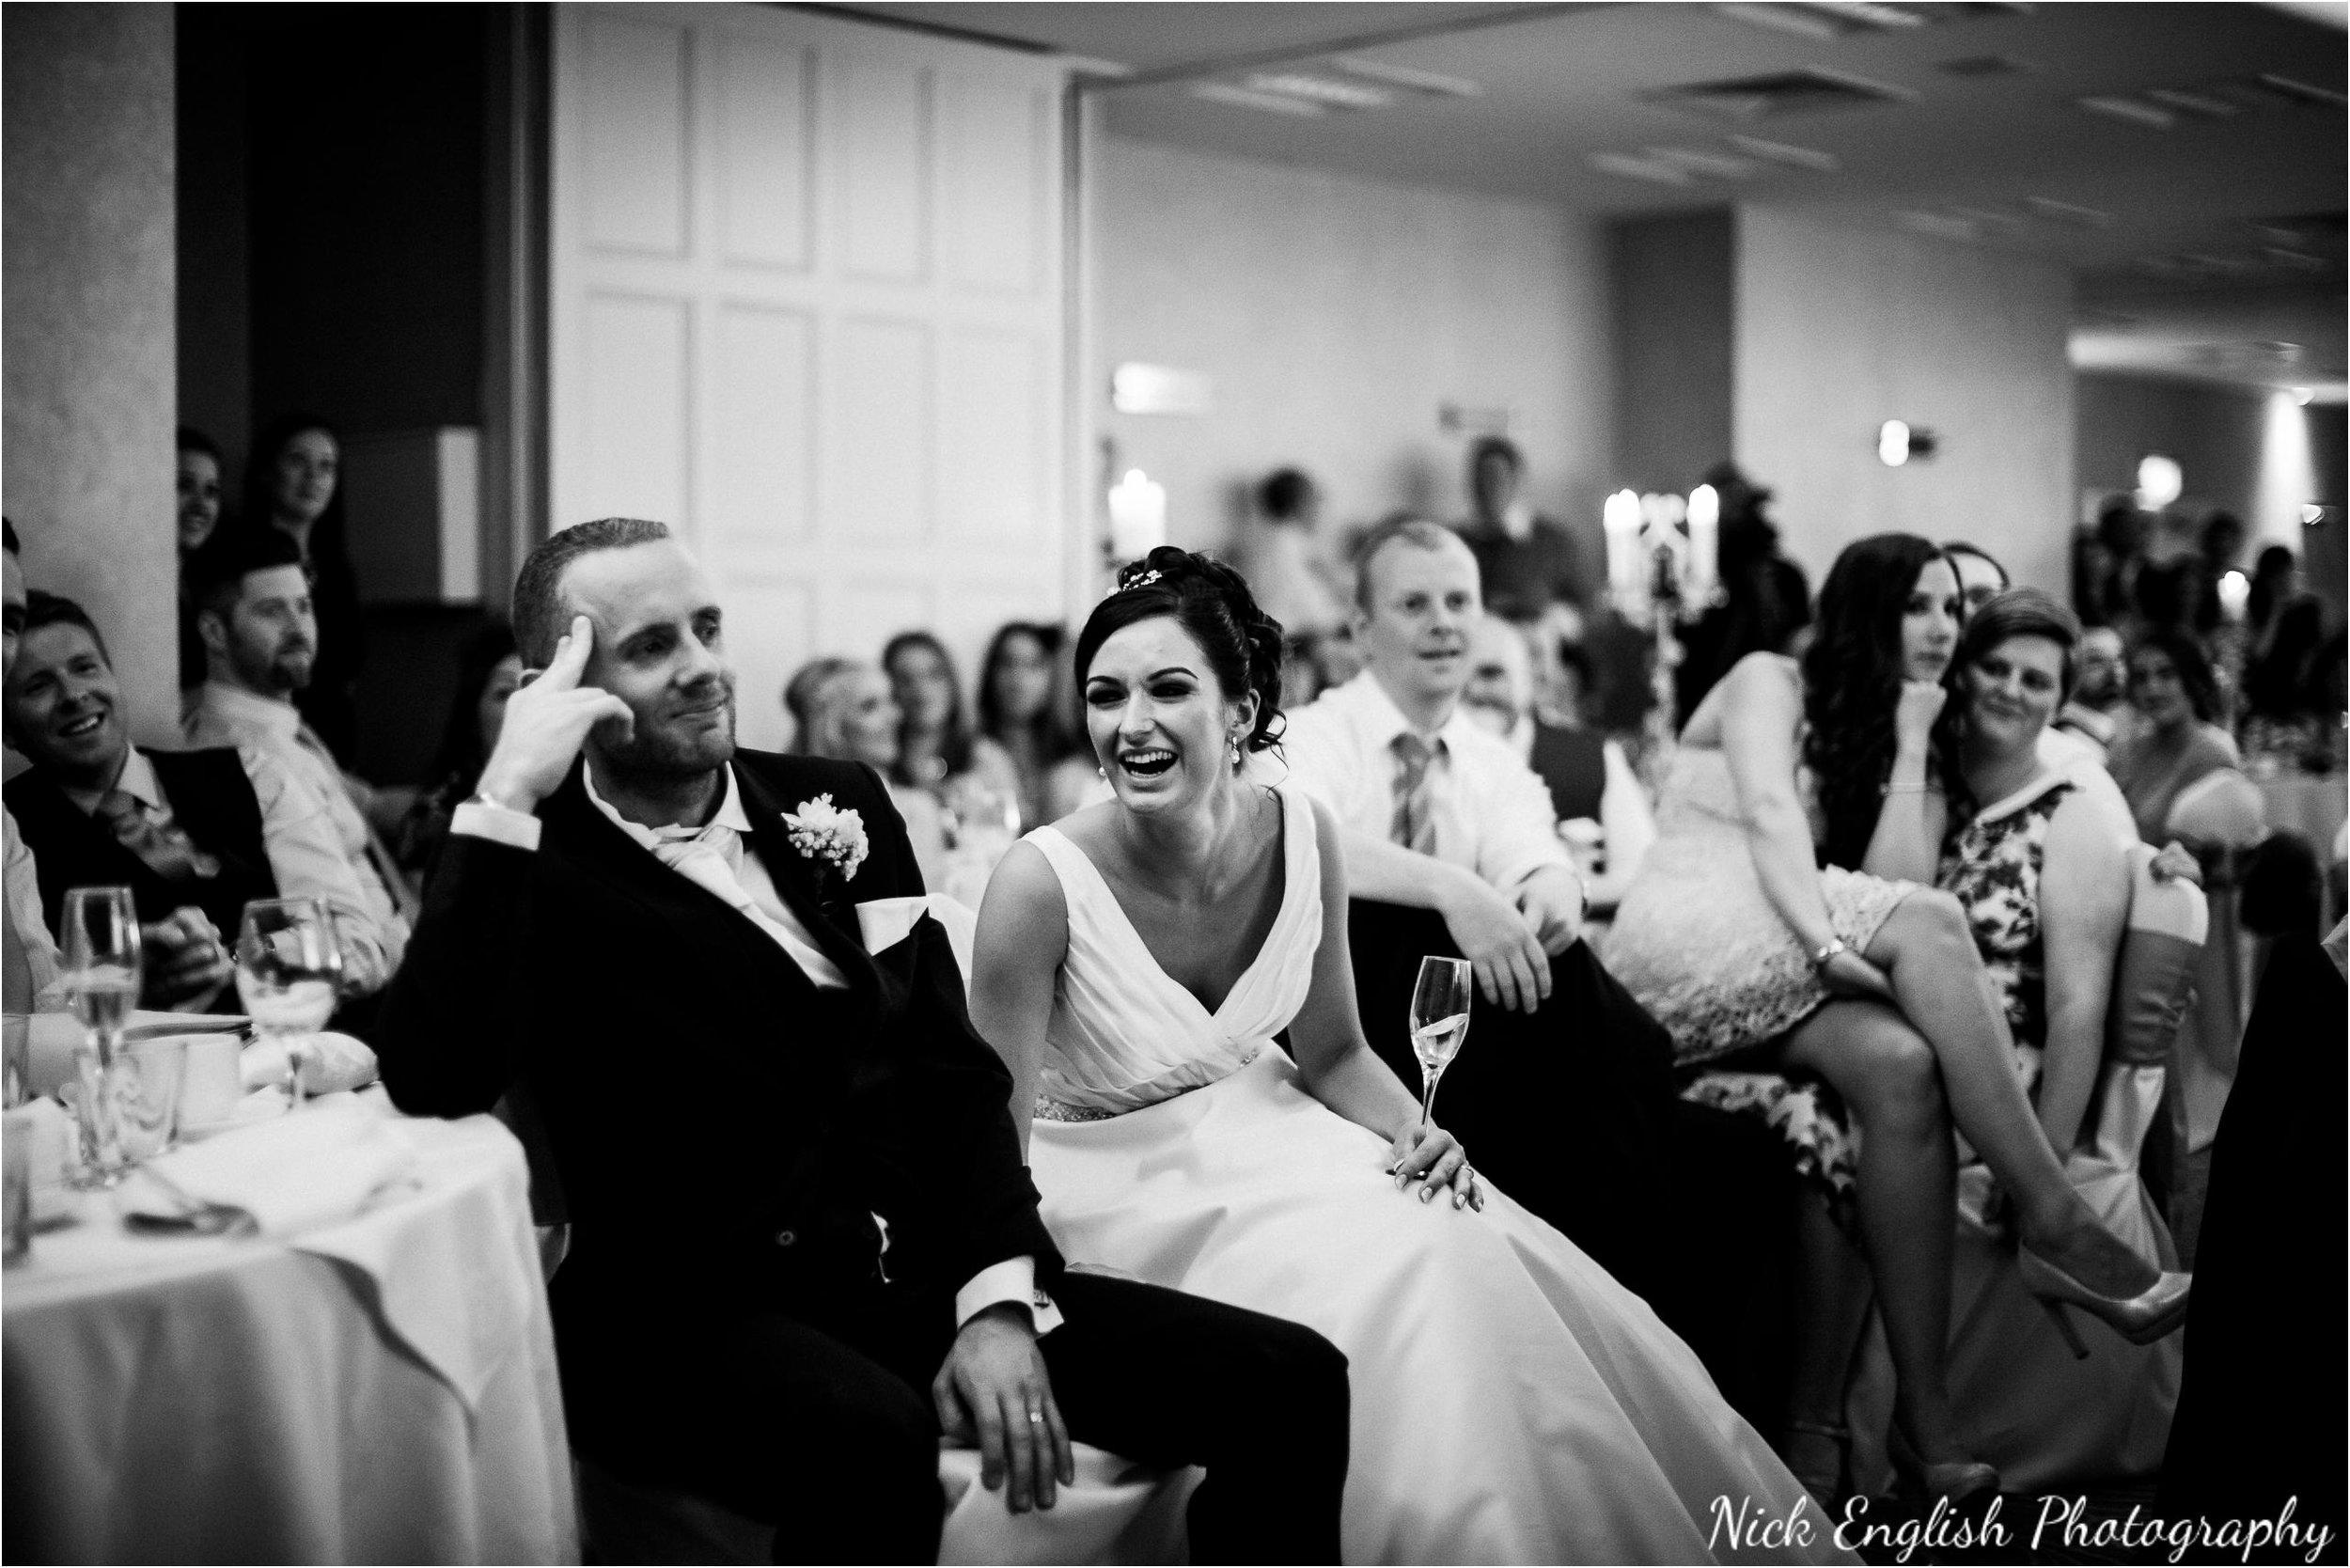 Emily David Wedding Photographs at Barton Grange Preston by Nick English Photography 189jpg.jpeg